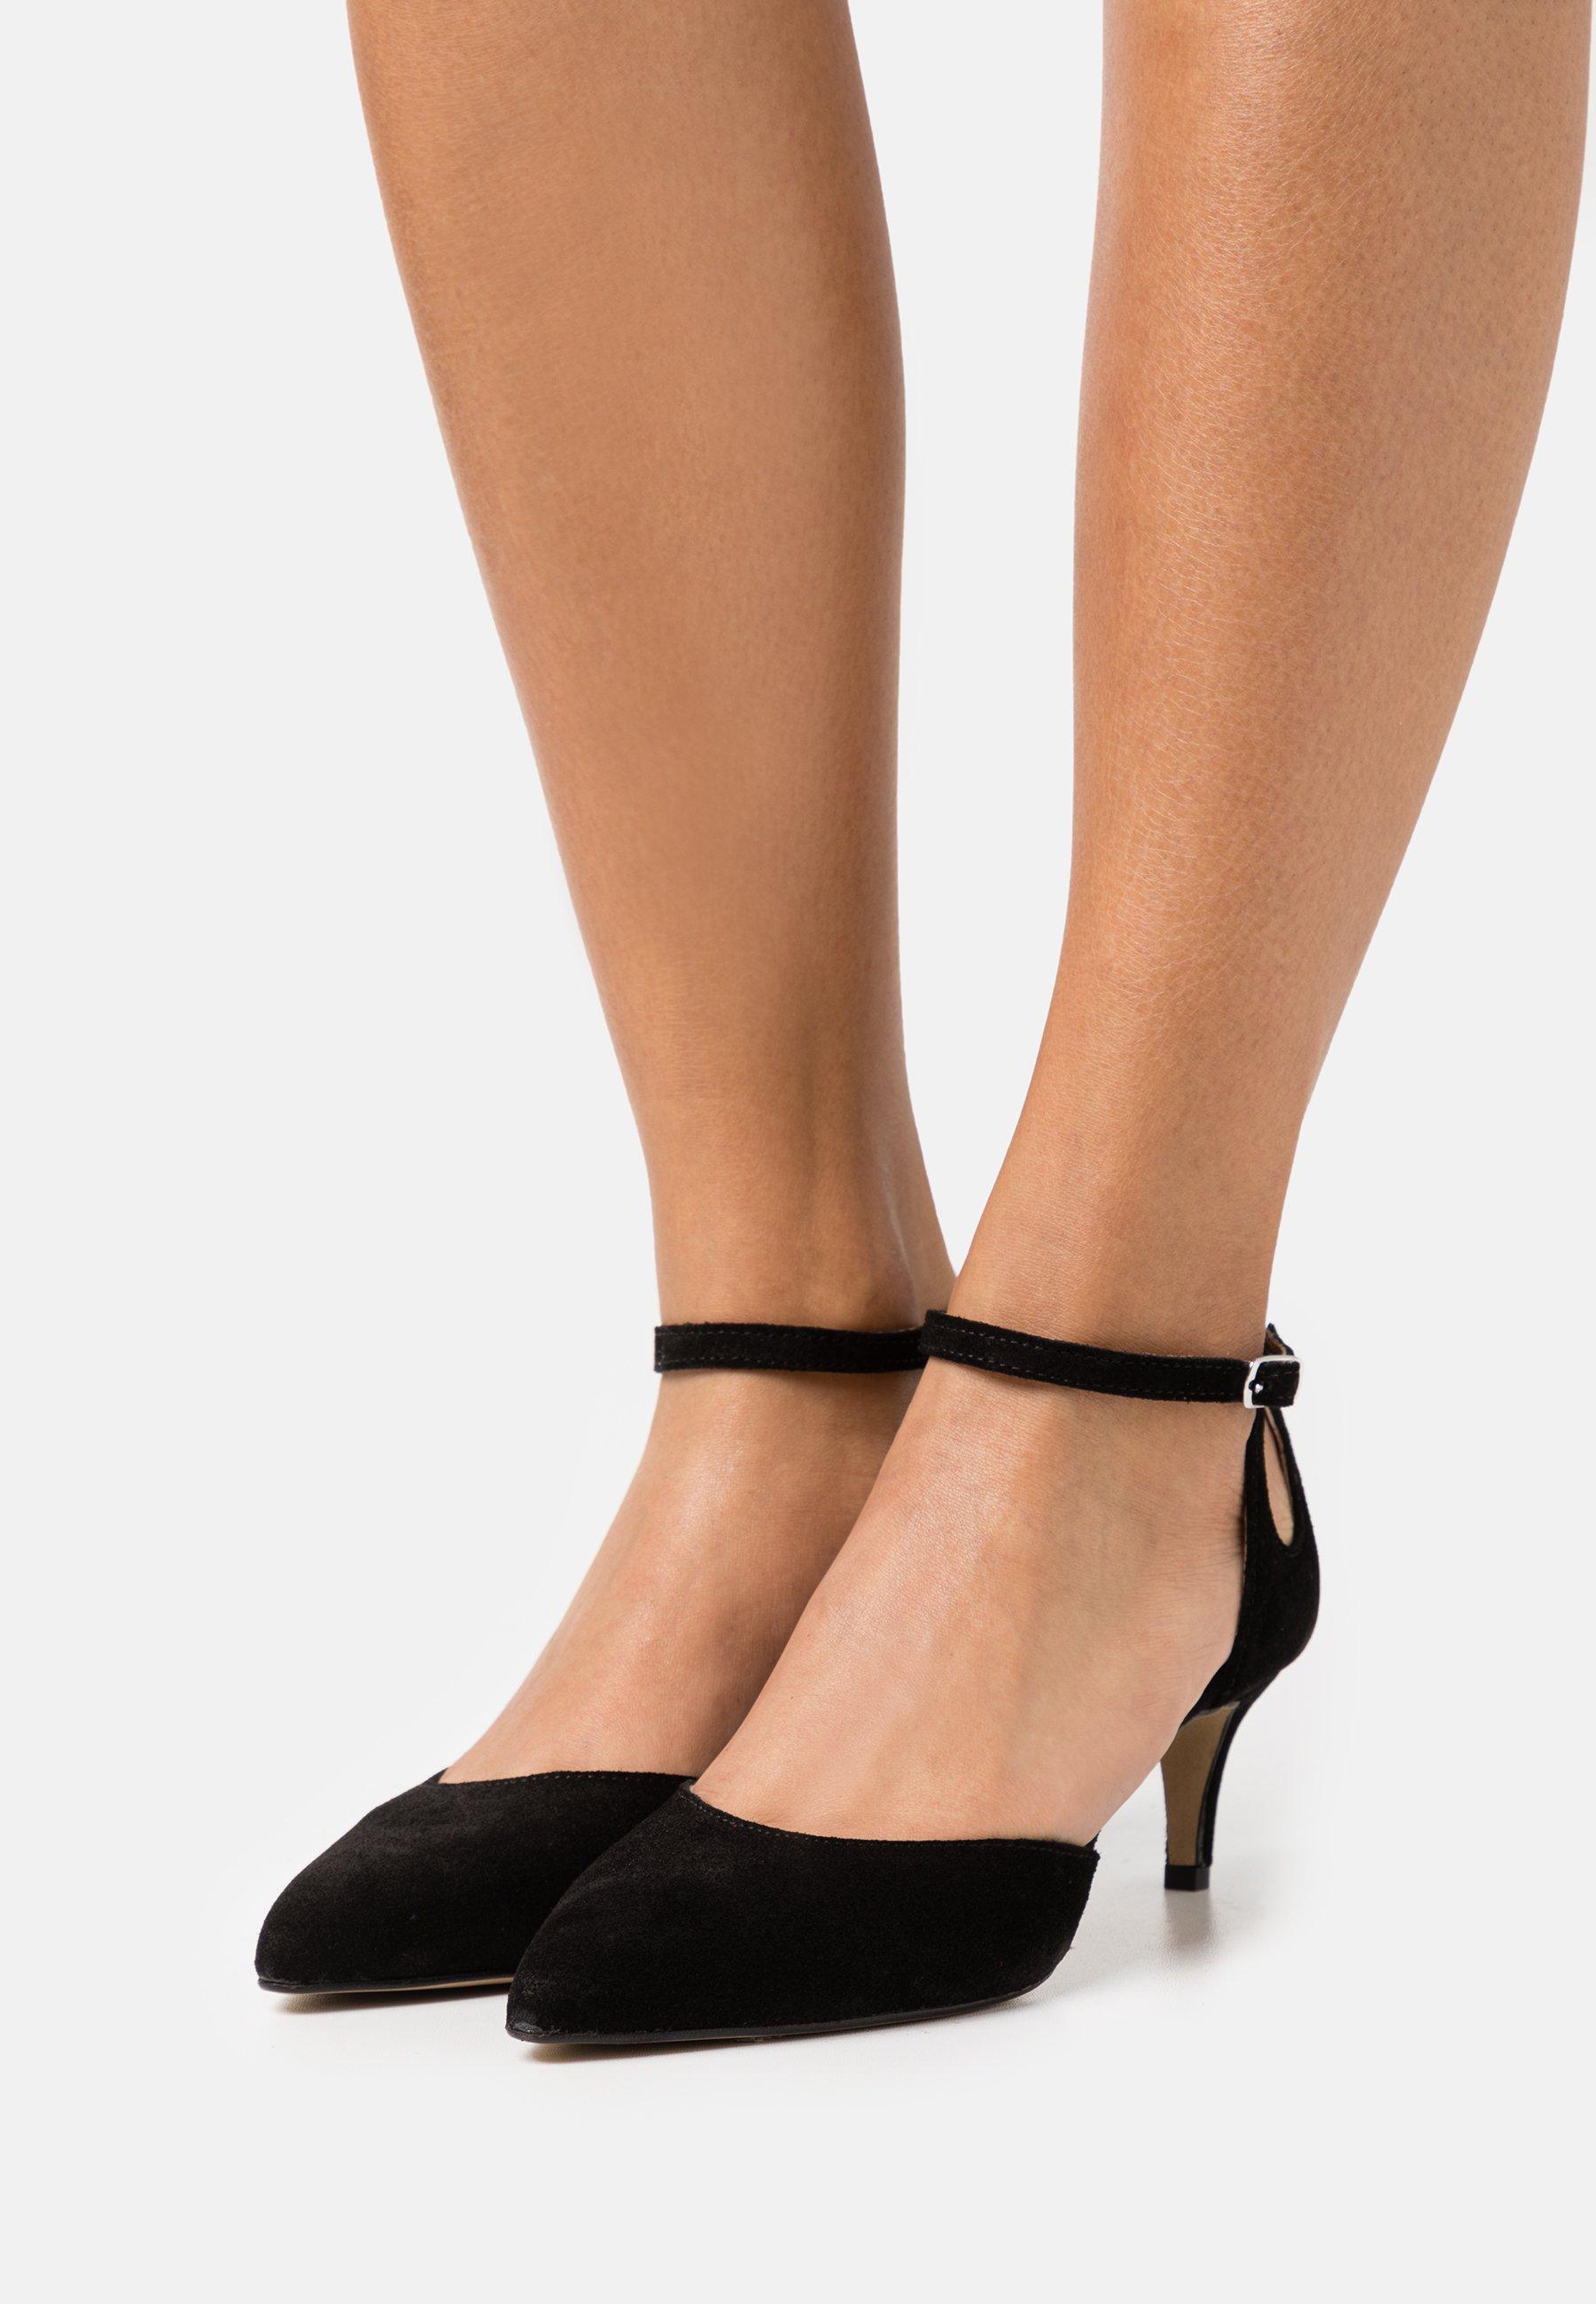 Femme BIADARBIE STRAP - Escarpins - black